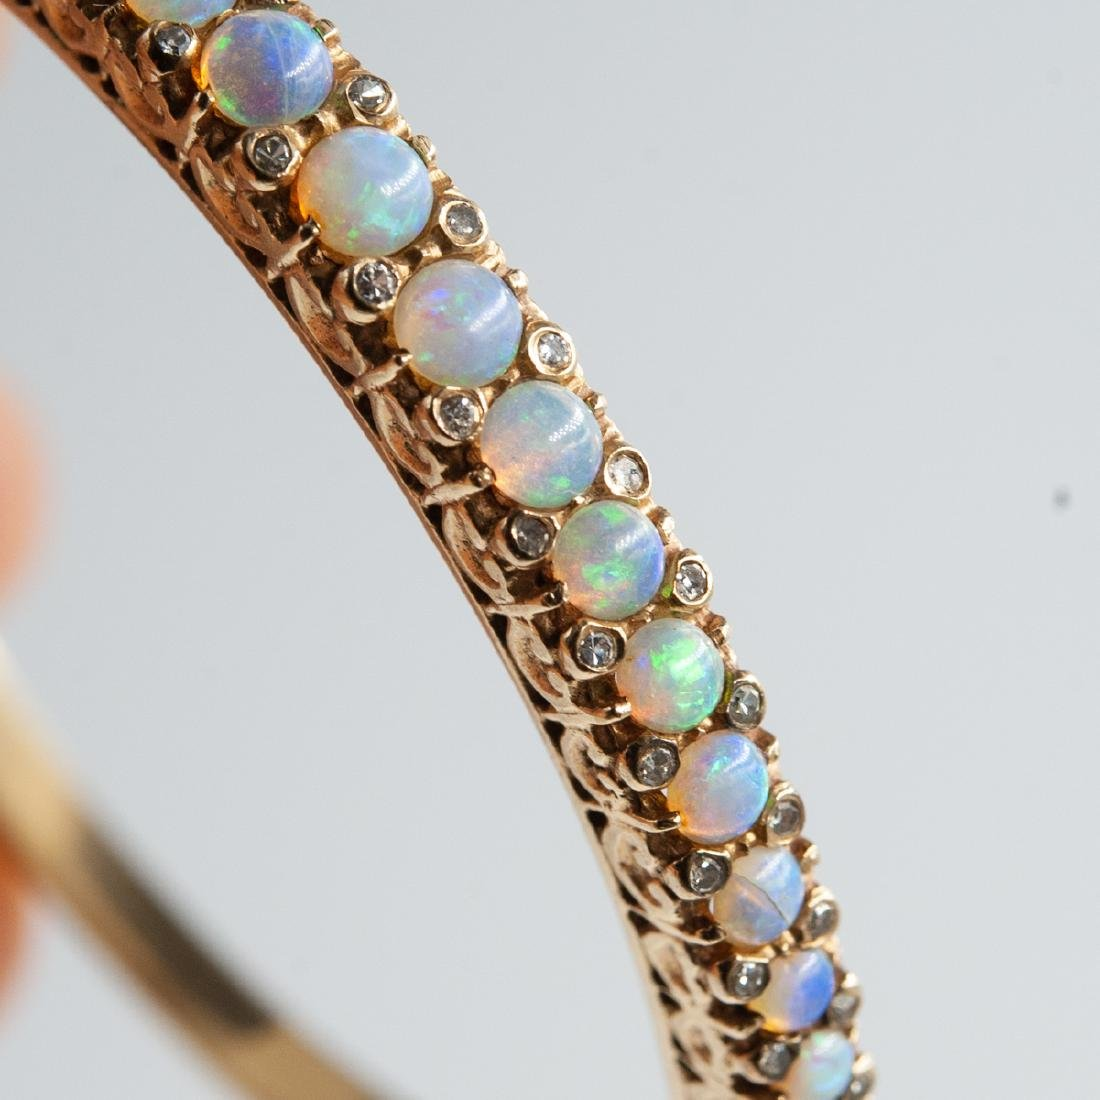 14K Gold & Opal Jewelry Set - 2